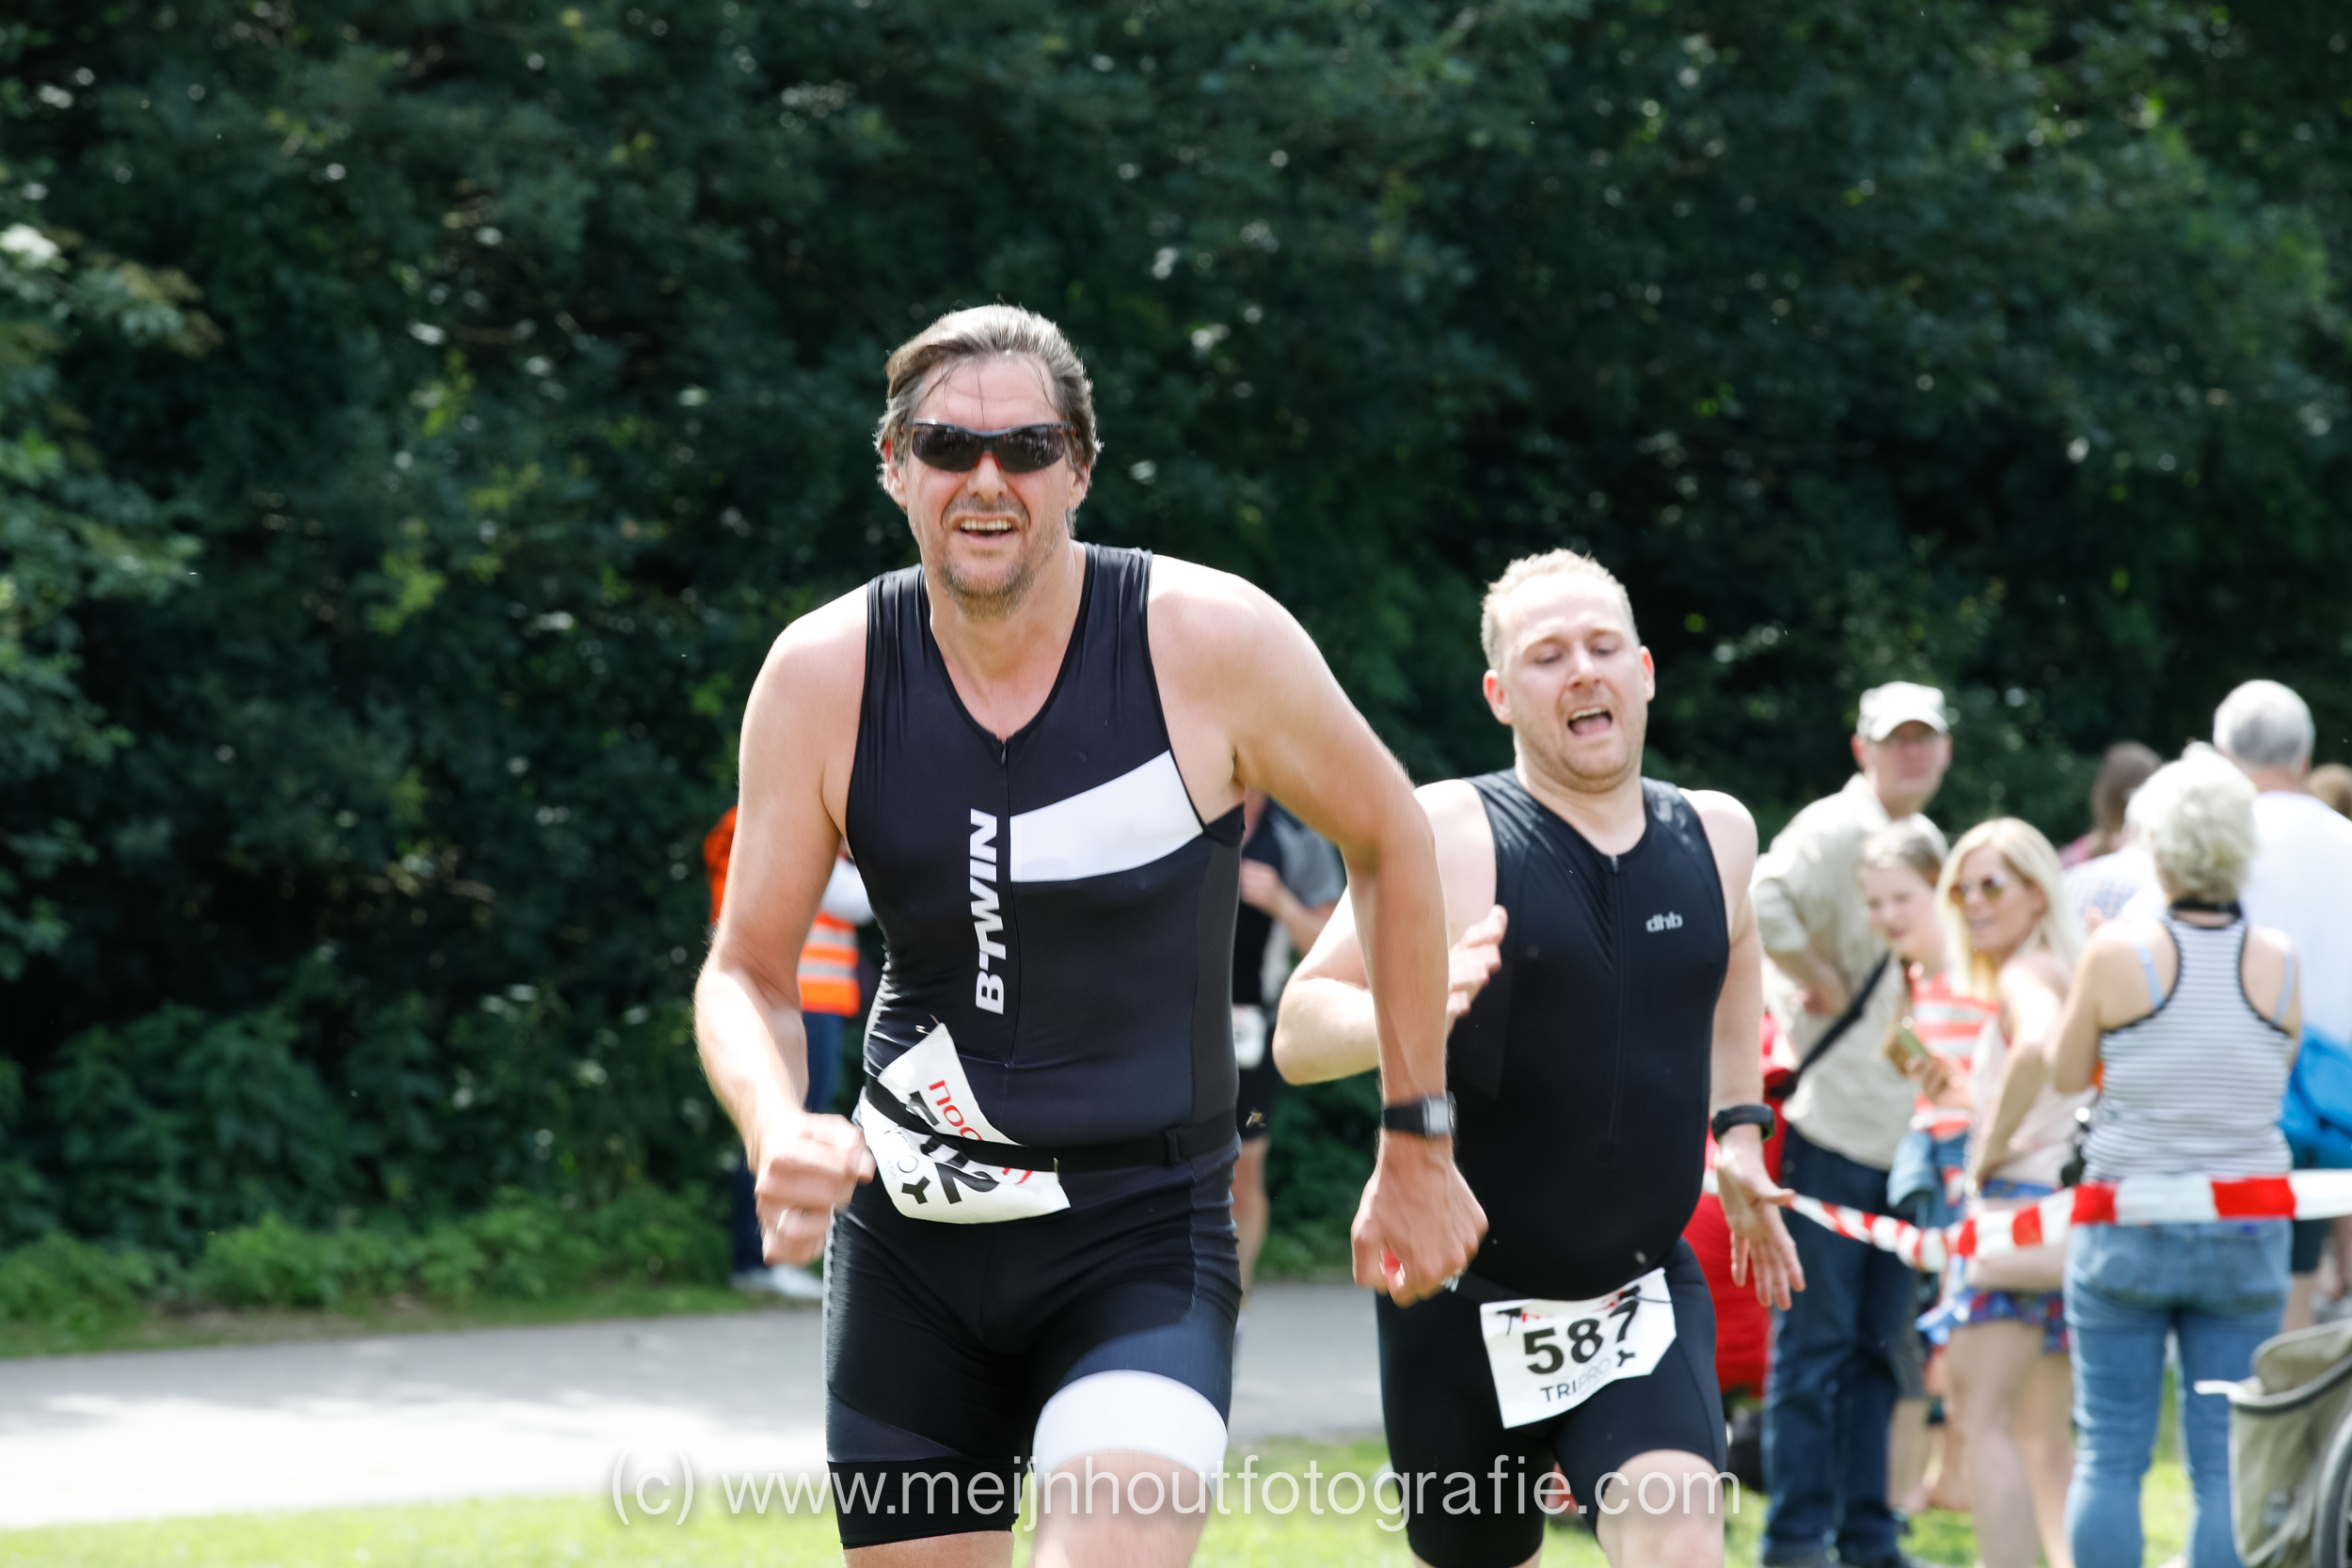 _MG_9211 Triathlon Huizen 2018 #298.jpg